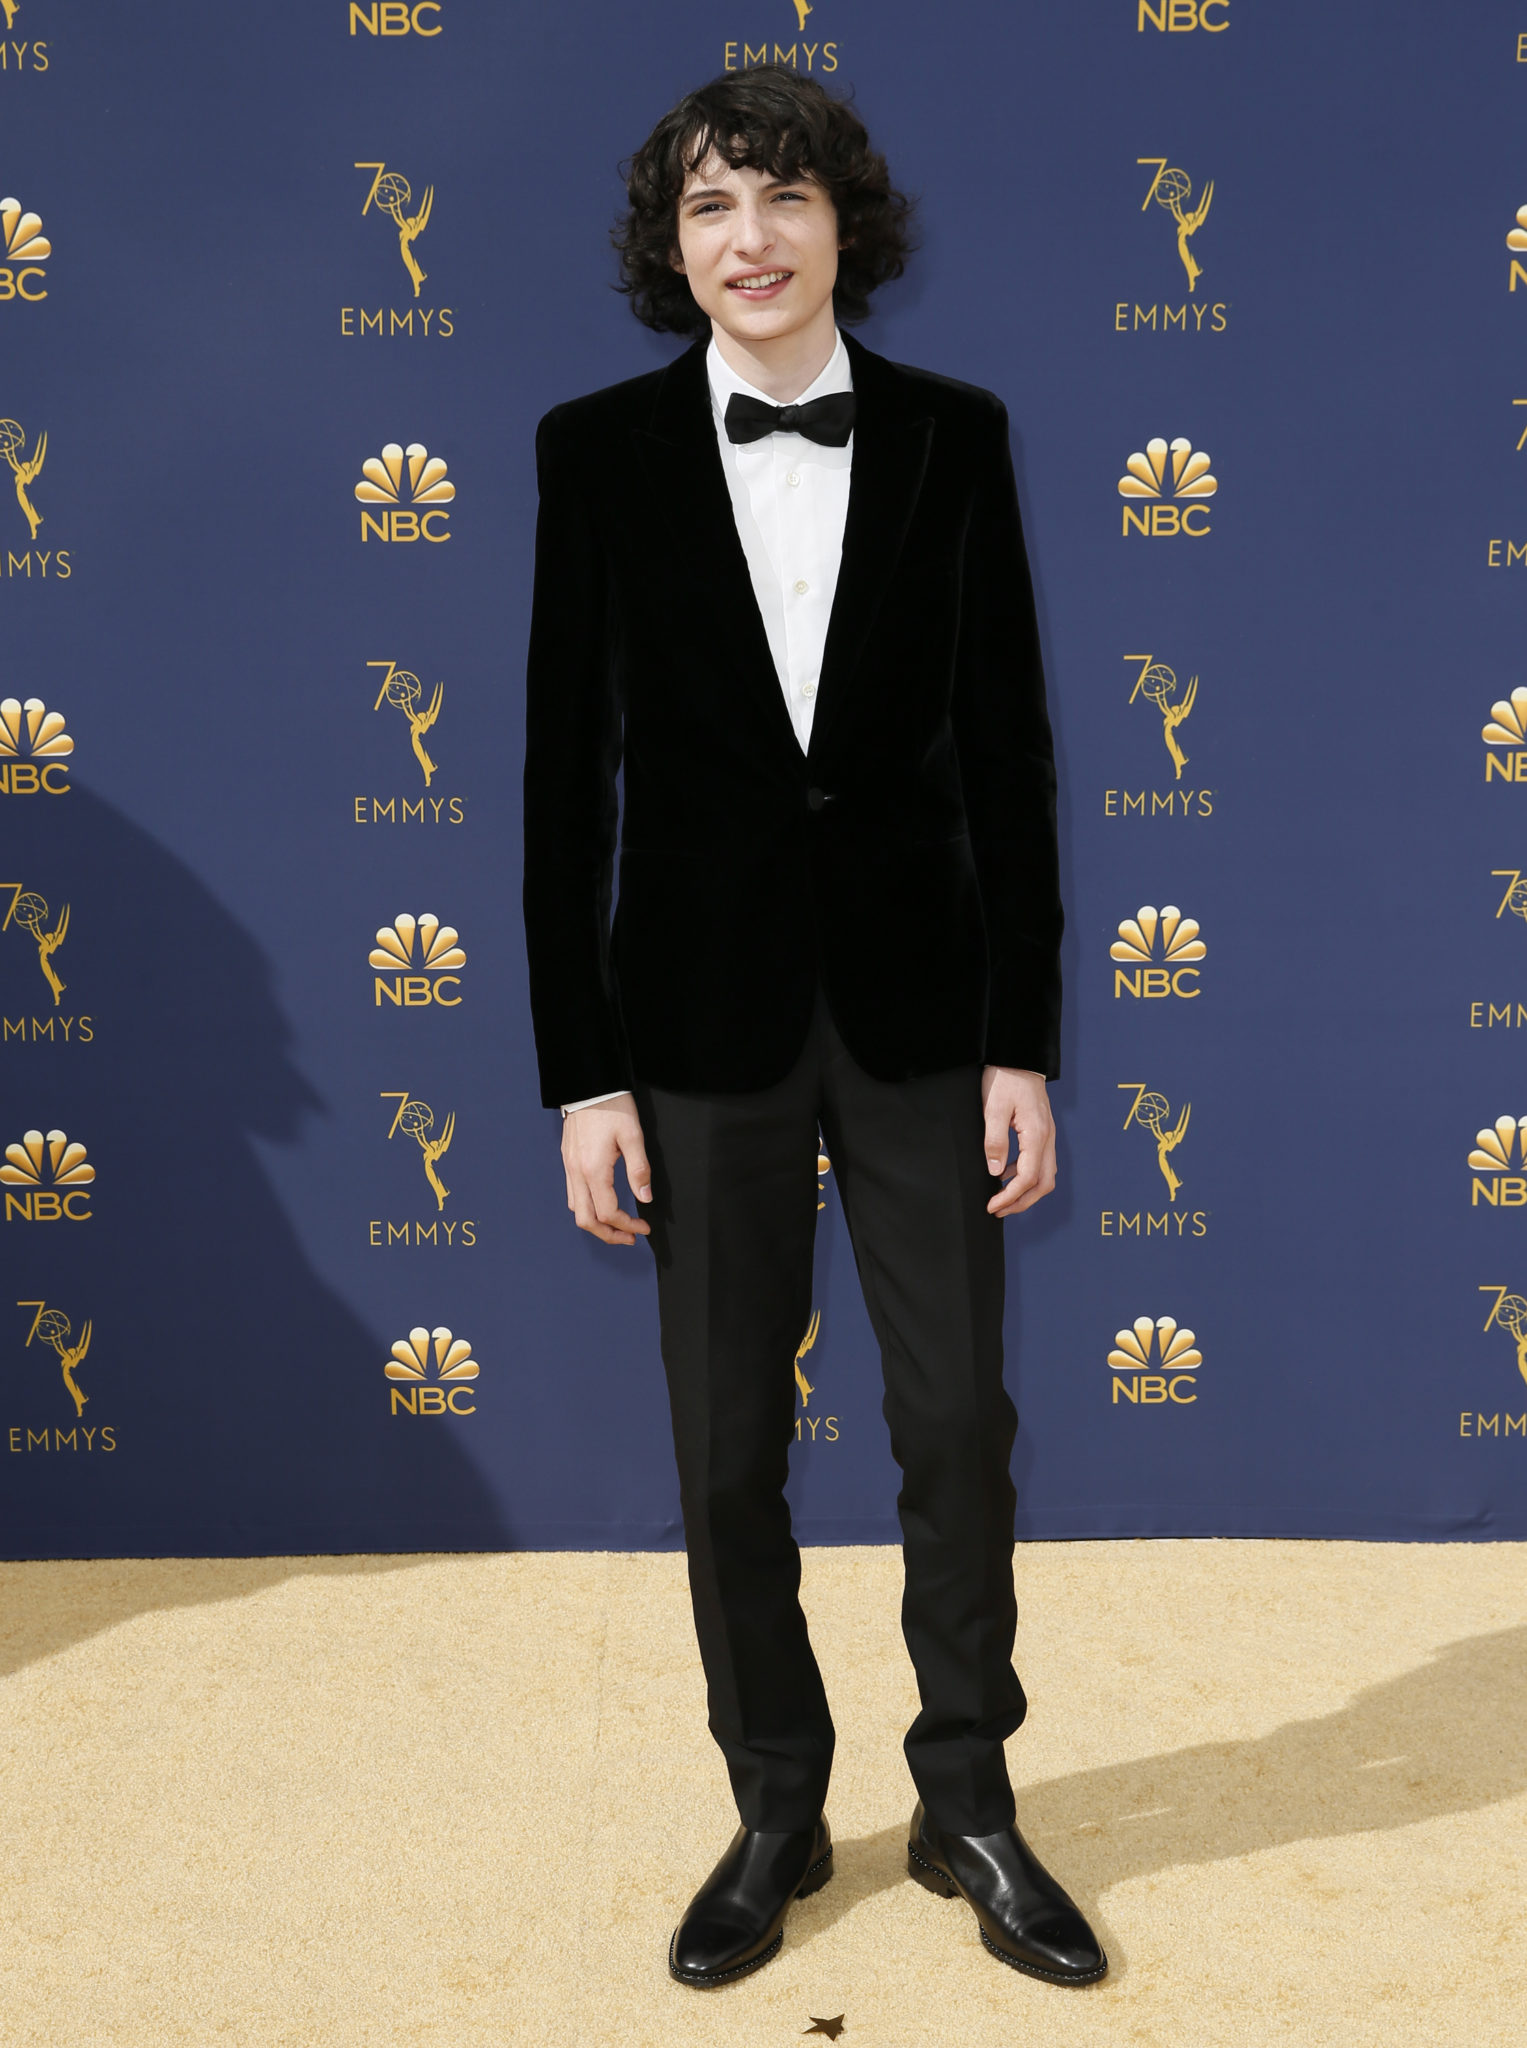 Finn Wolfhard Emmys 4Chion Lifestyle